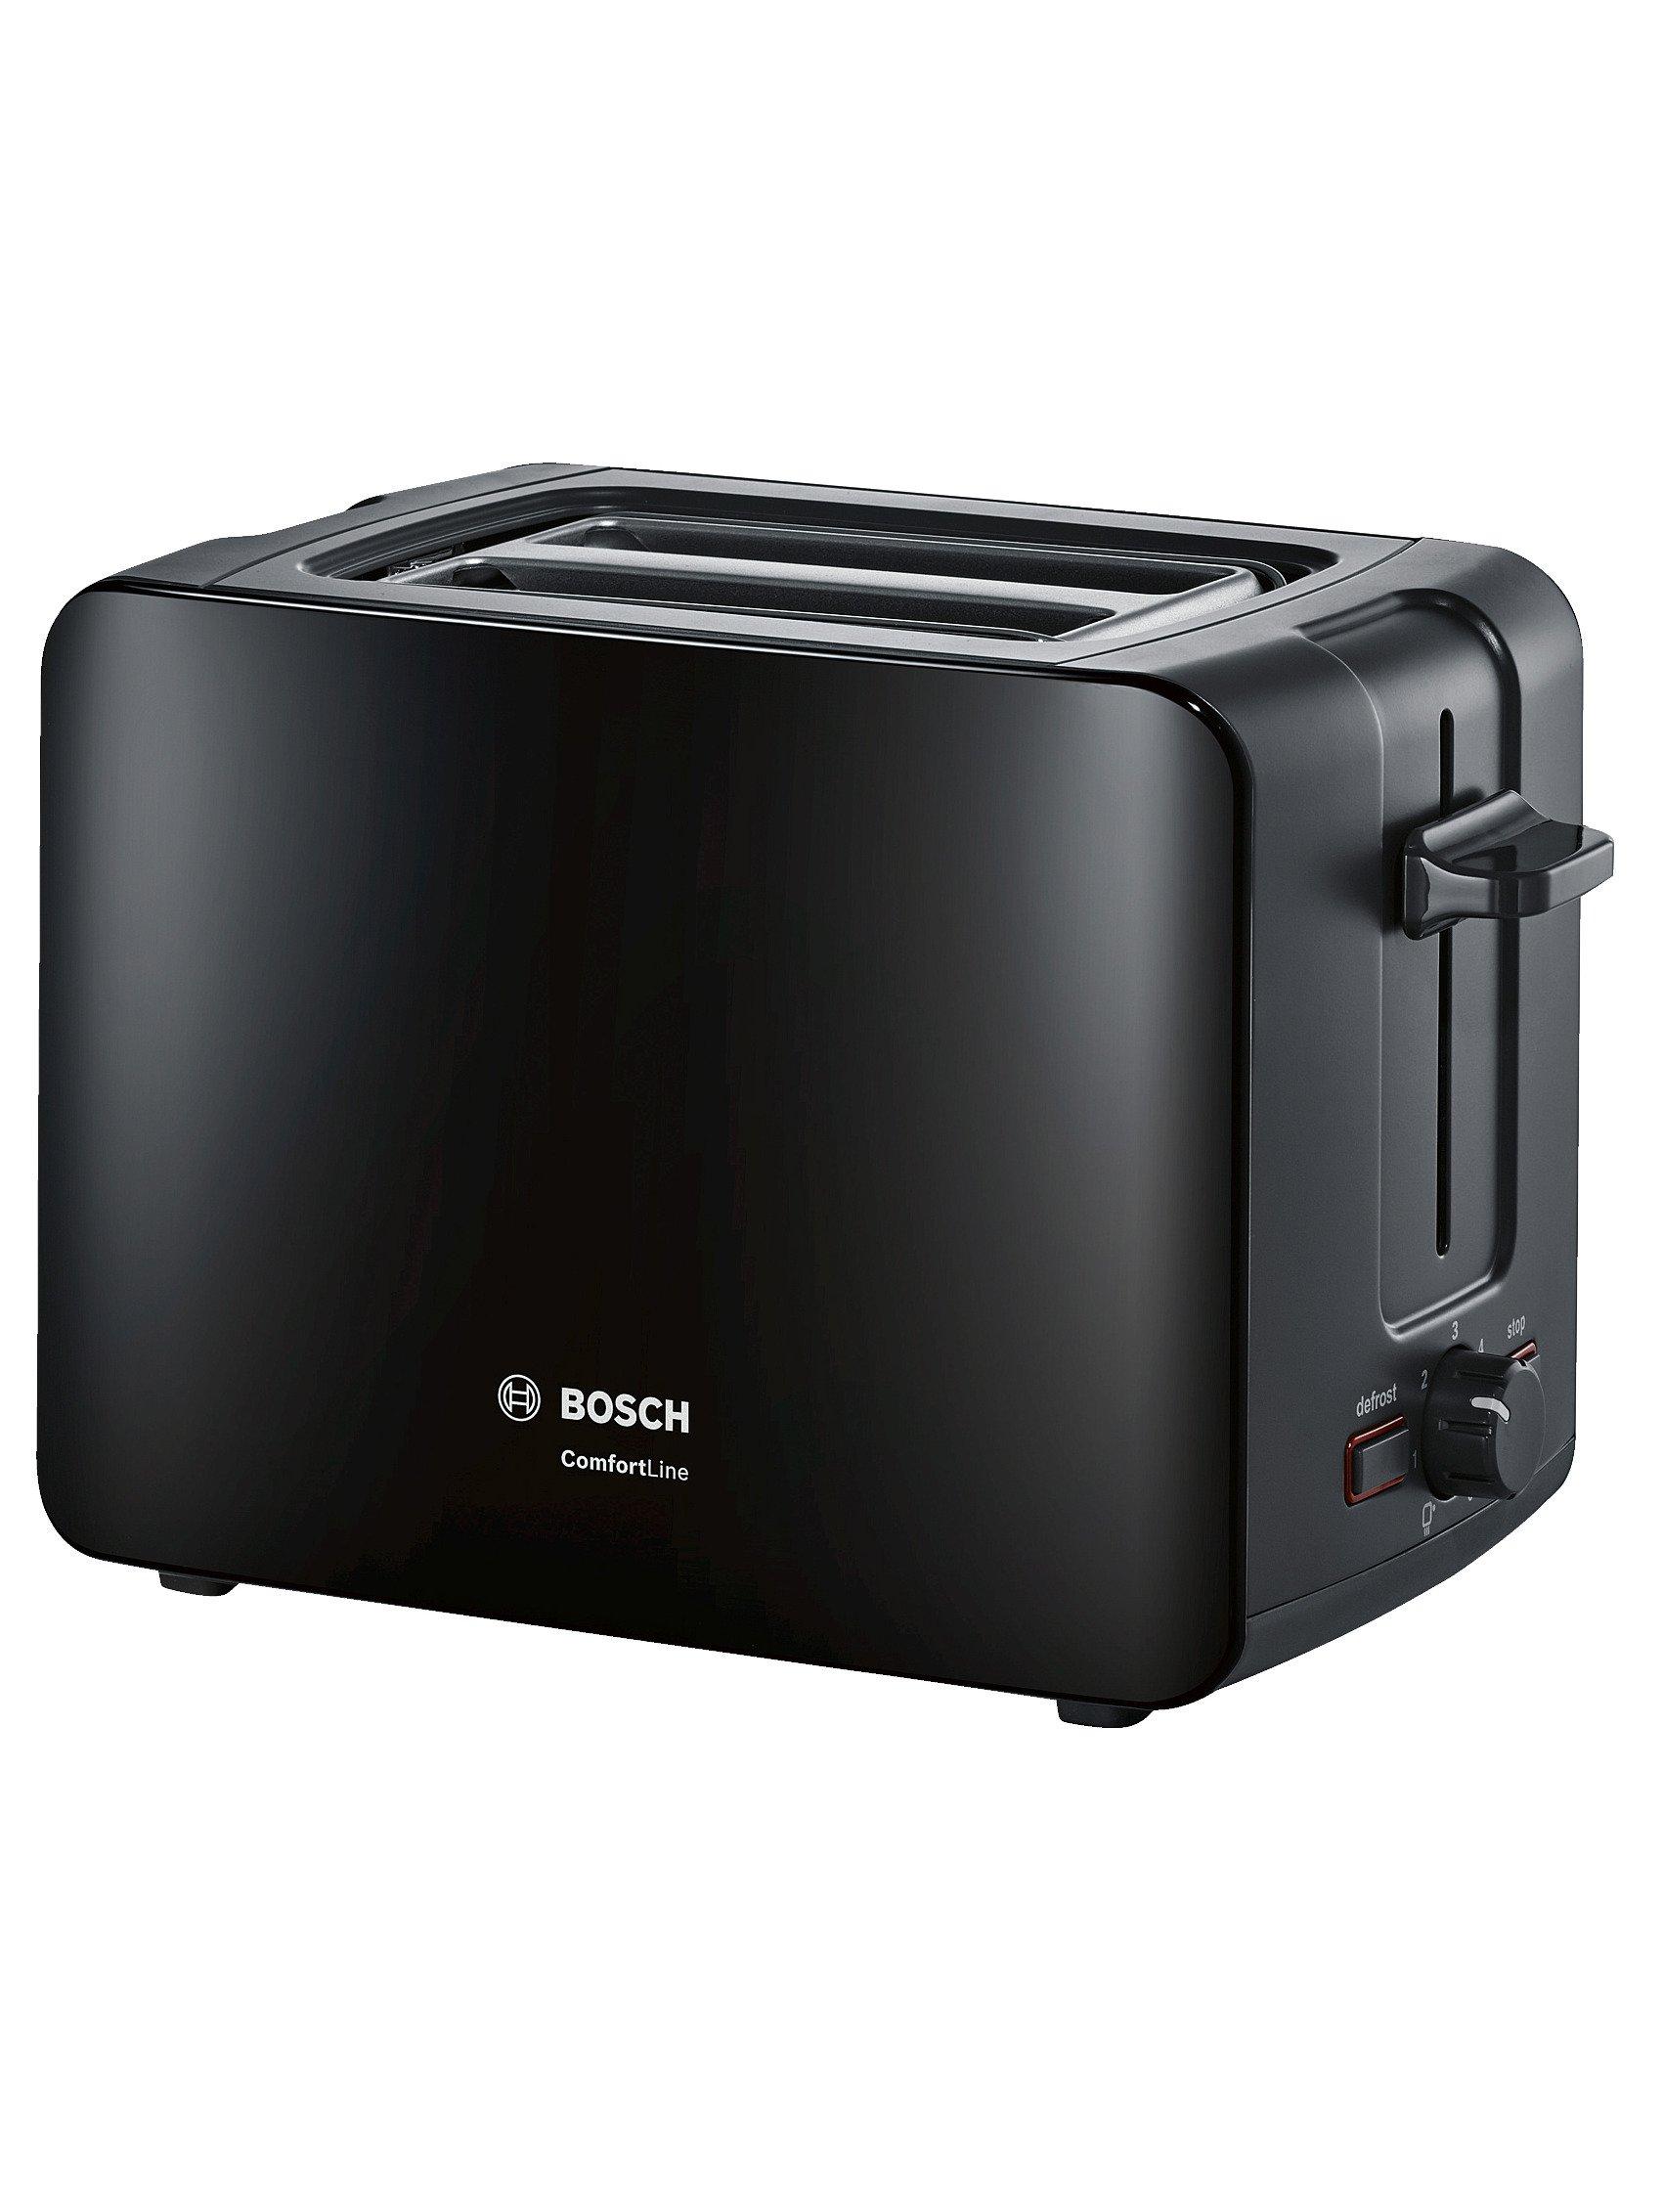 Bosch-Bosch-Kompakt-Toaster-ComfortLine